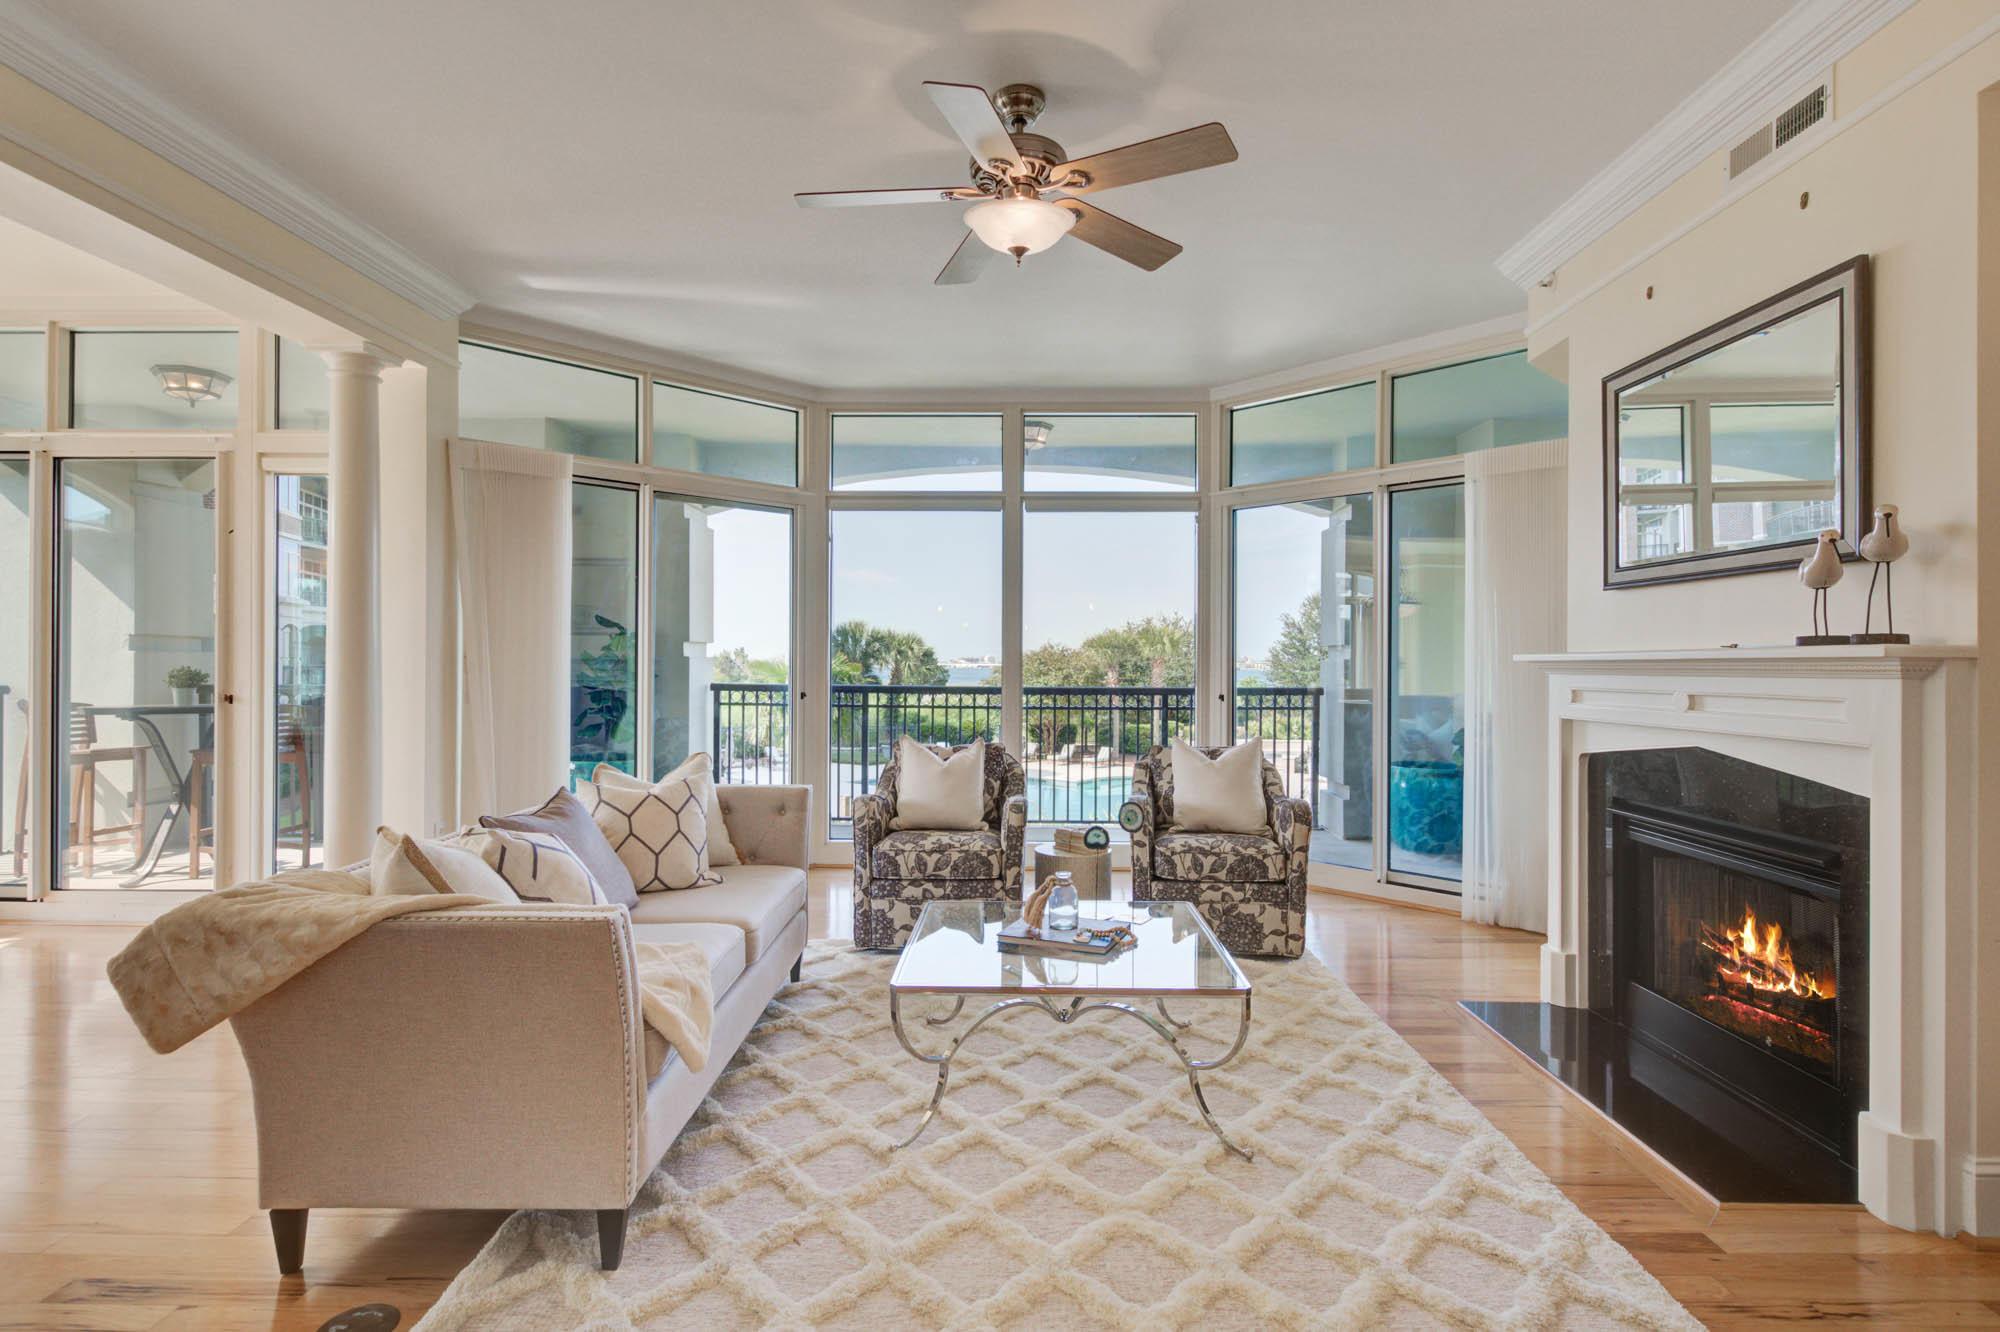 Renaissance On Chas Harbor Homes For Sale - 125 Plaza, Mount Pleasant, SC - 26